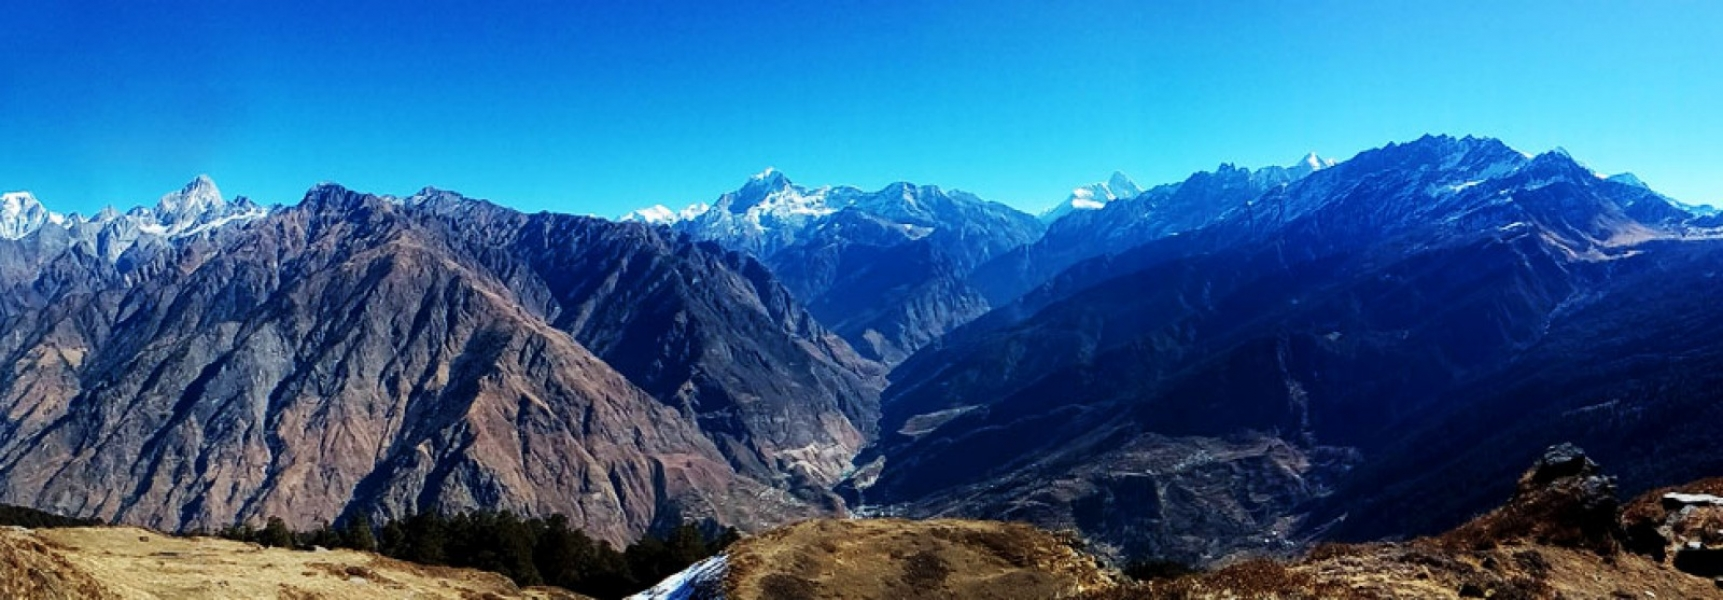 Trek to Pangarchulla peak and Kuari pass